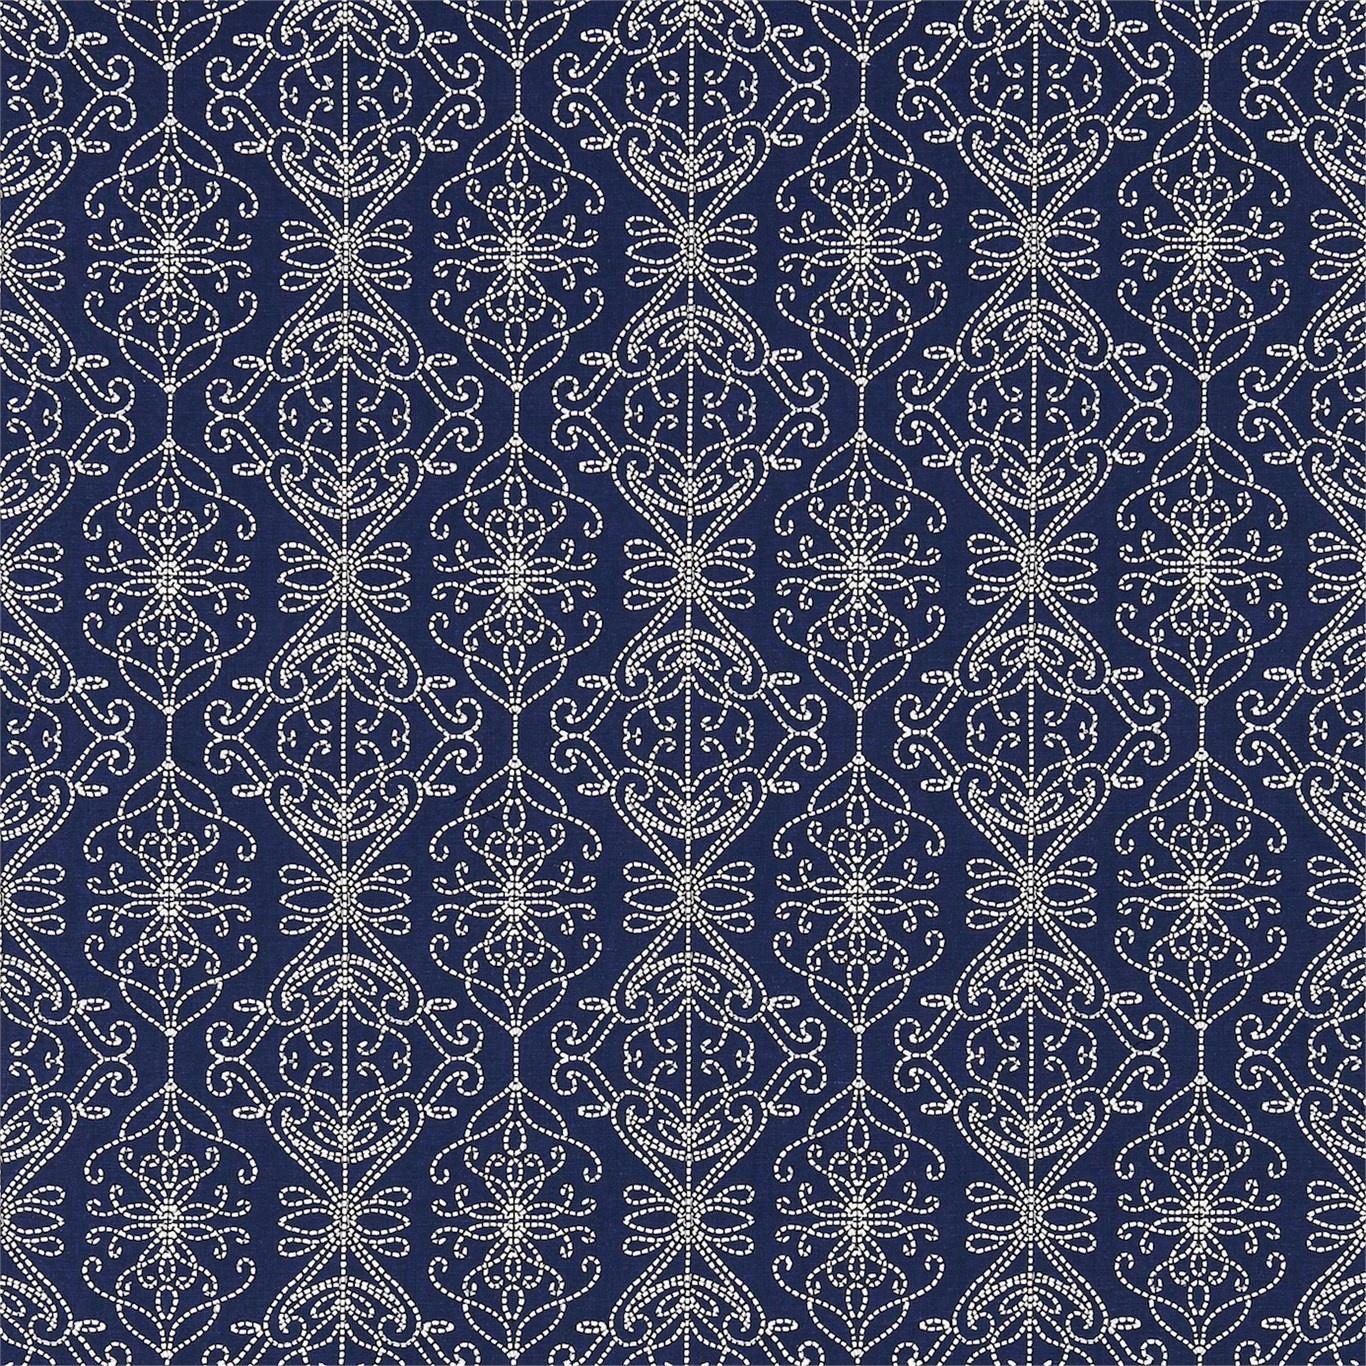 Image of Harlequin Java Indigo/Ink Curtain Fabric 131519